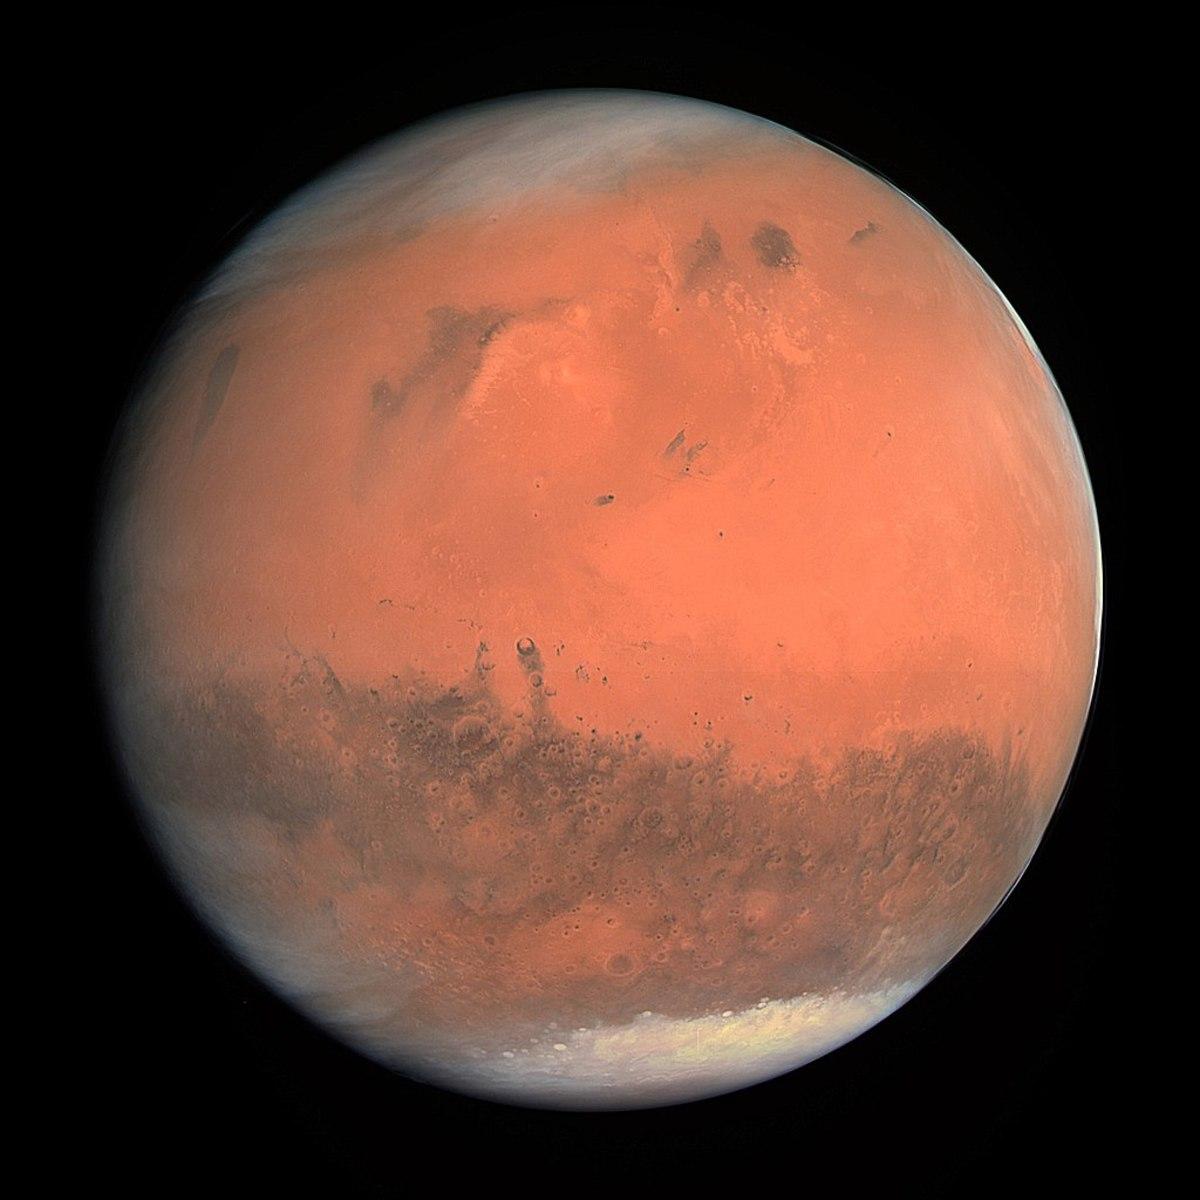 Mars: Quick Facts